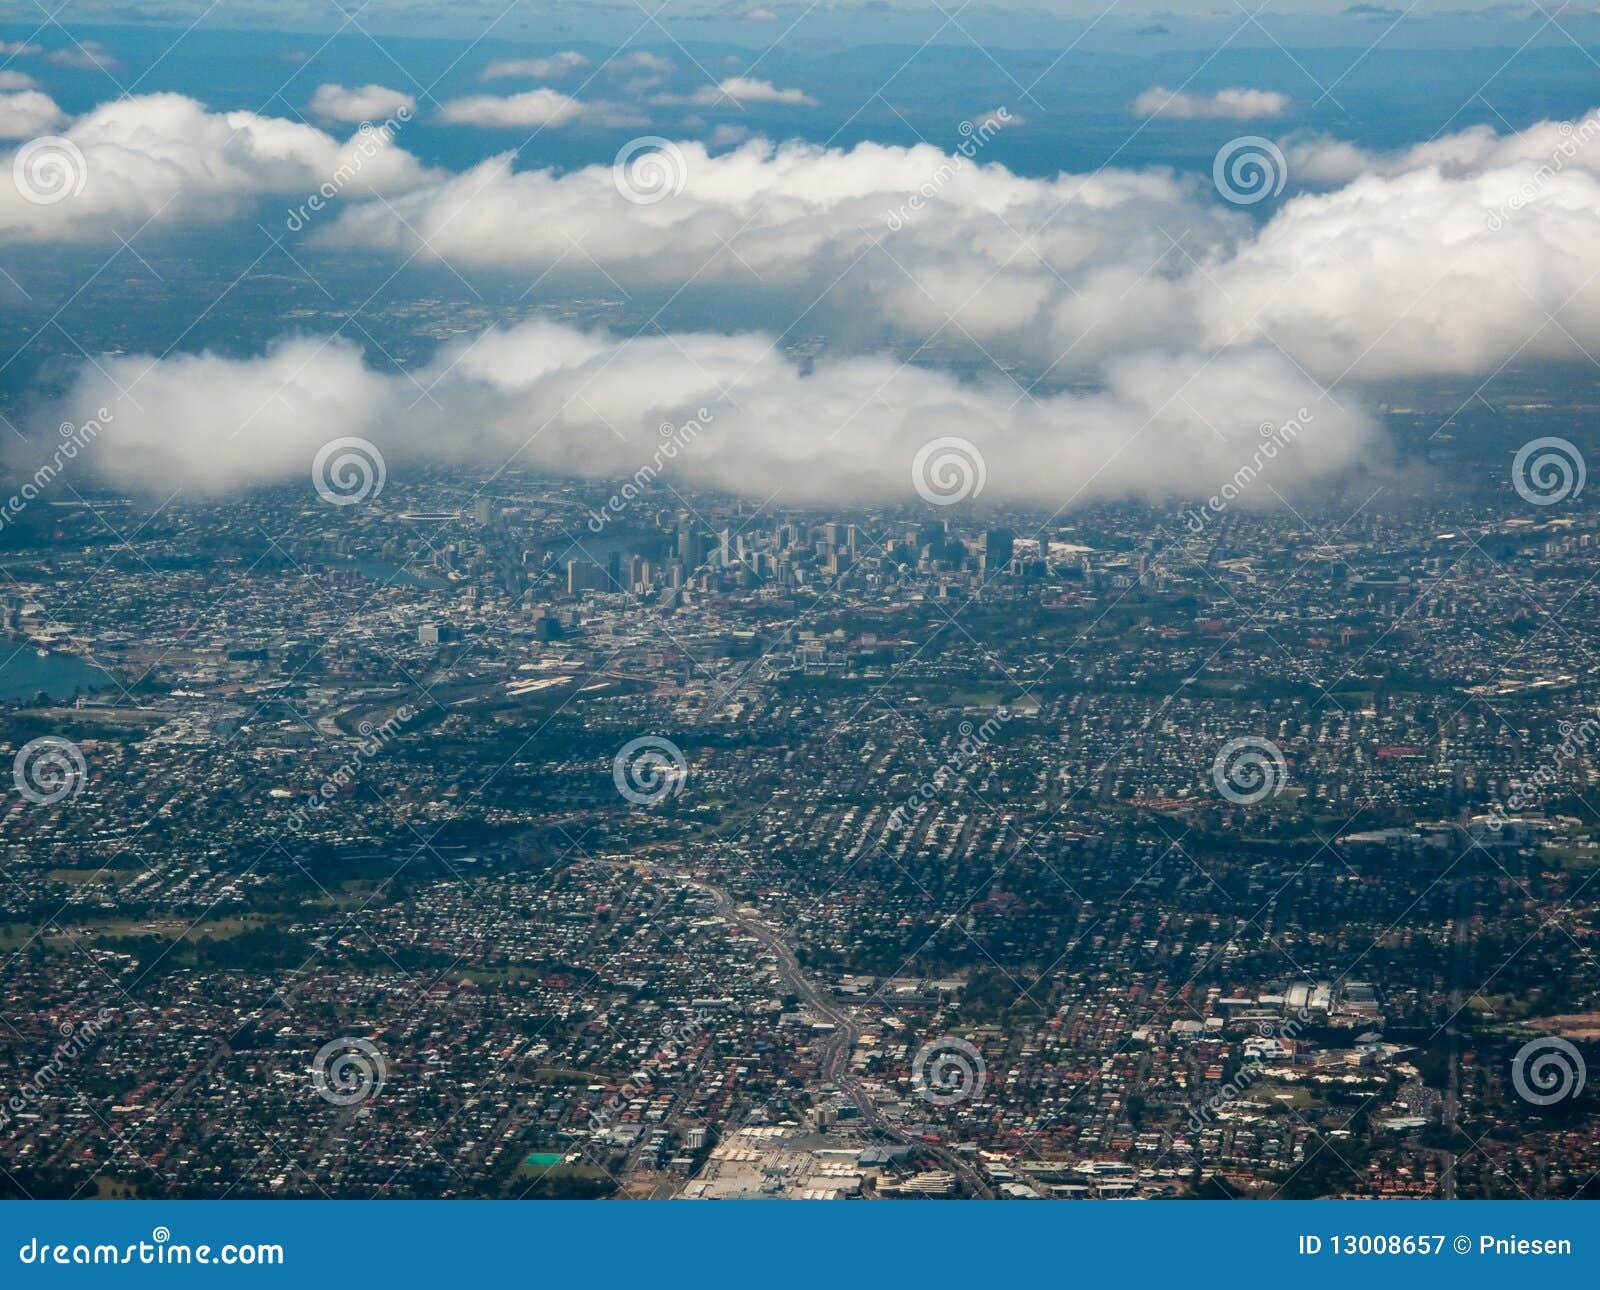 Aerial View of the City of Brisbane, Australia